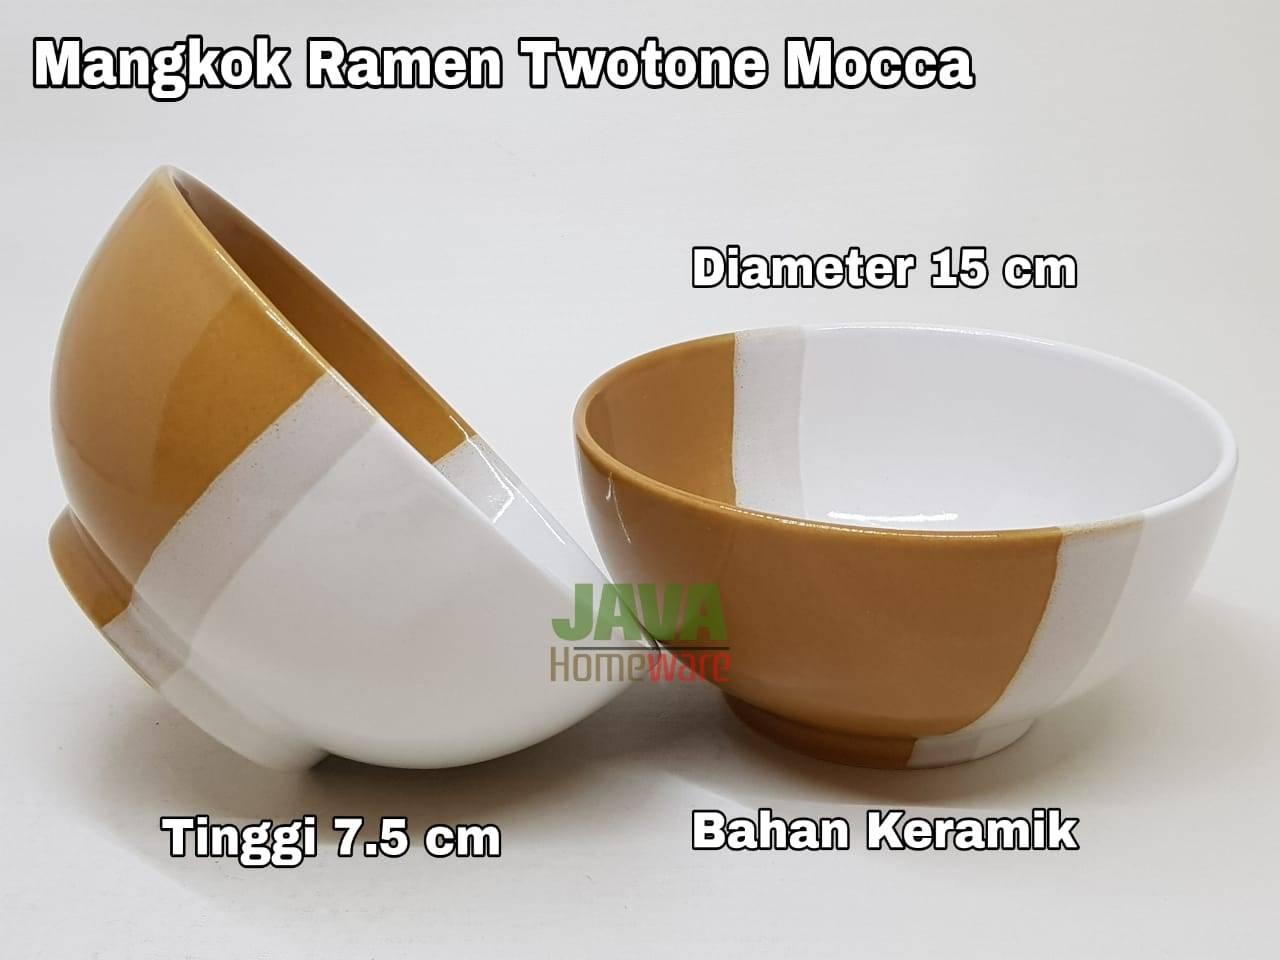 Mangkok Twotone Ramen Mocca